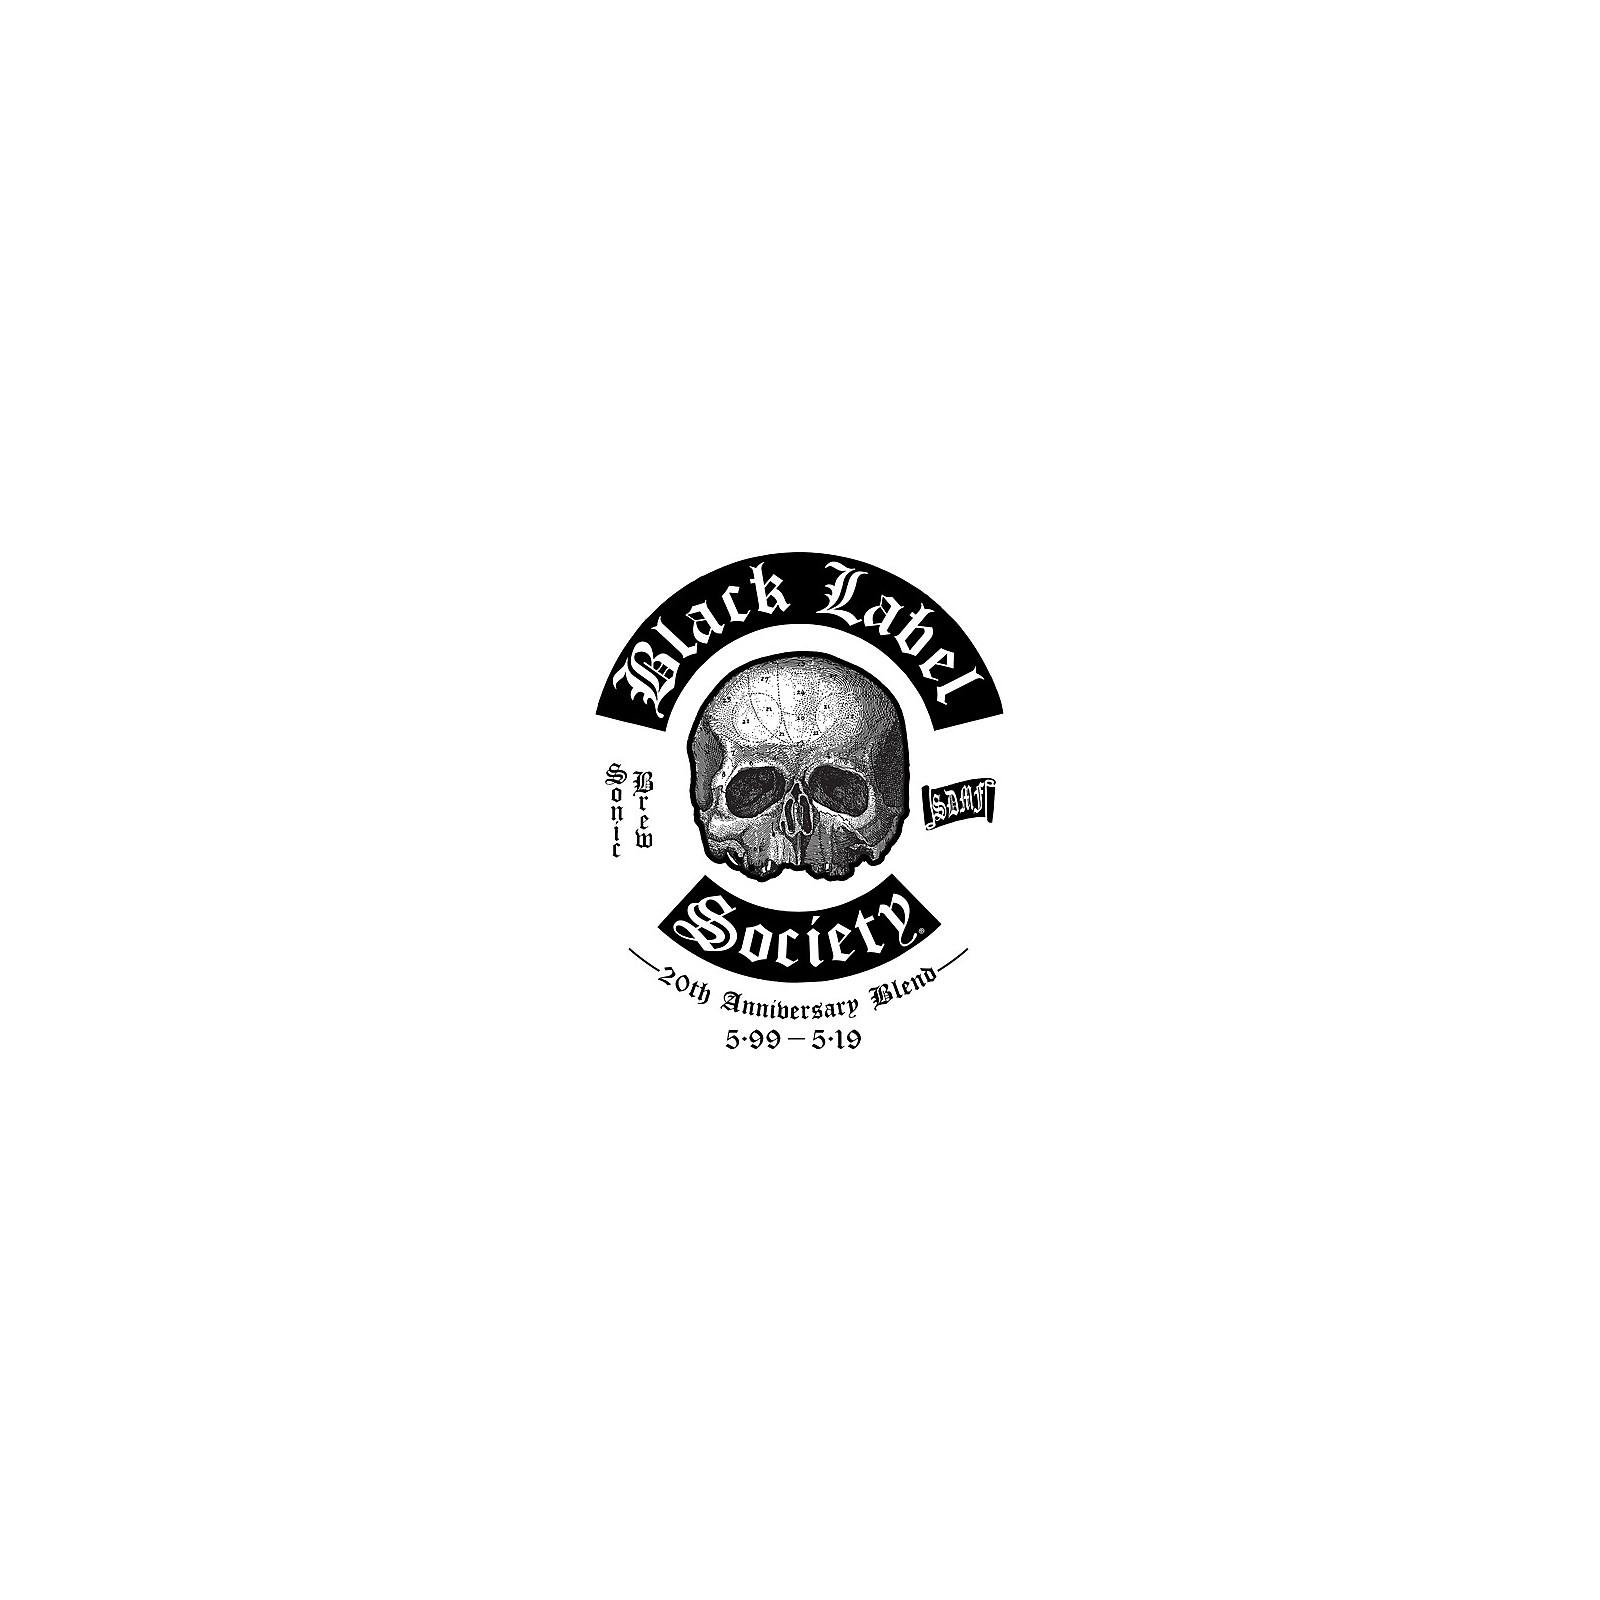 Alliance Black Label Society - Sonic Brew 20th Anniversary Blend 5.99 - 5.19